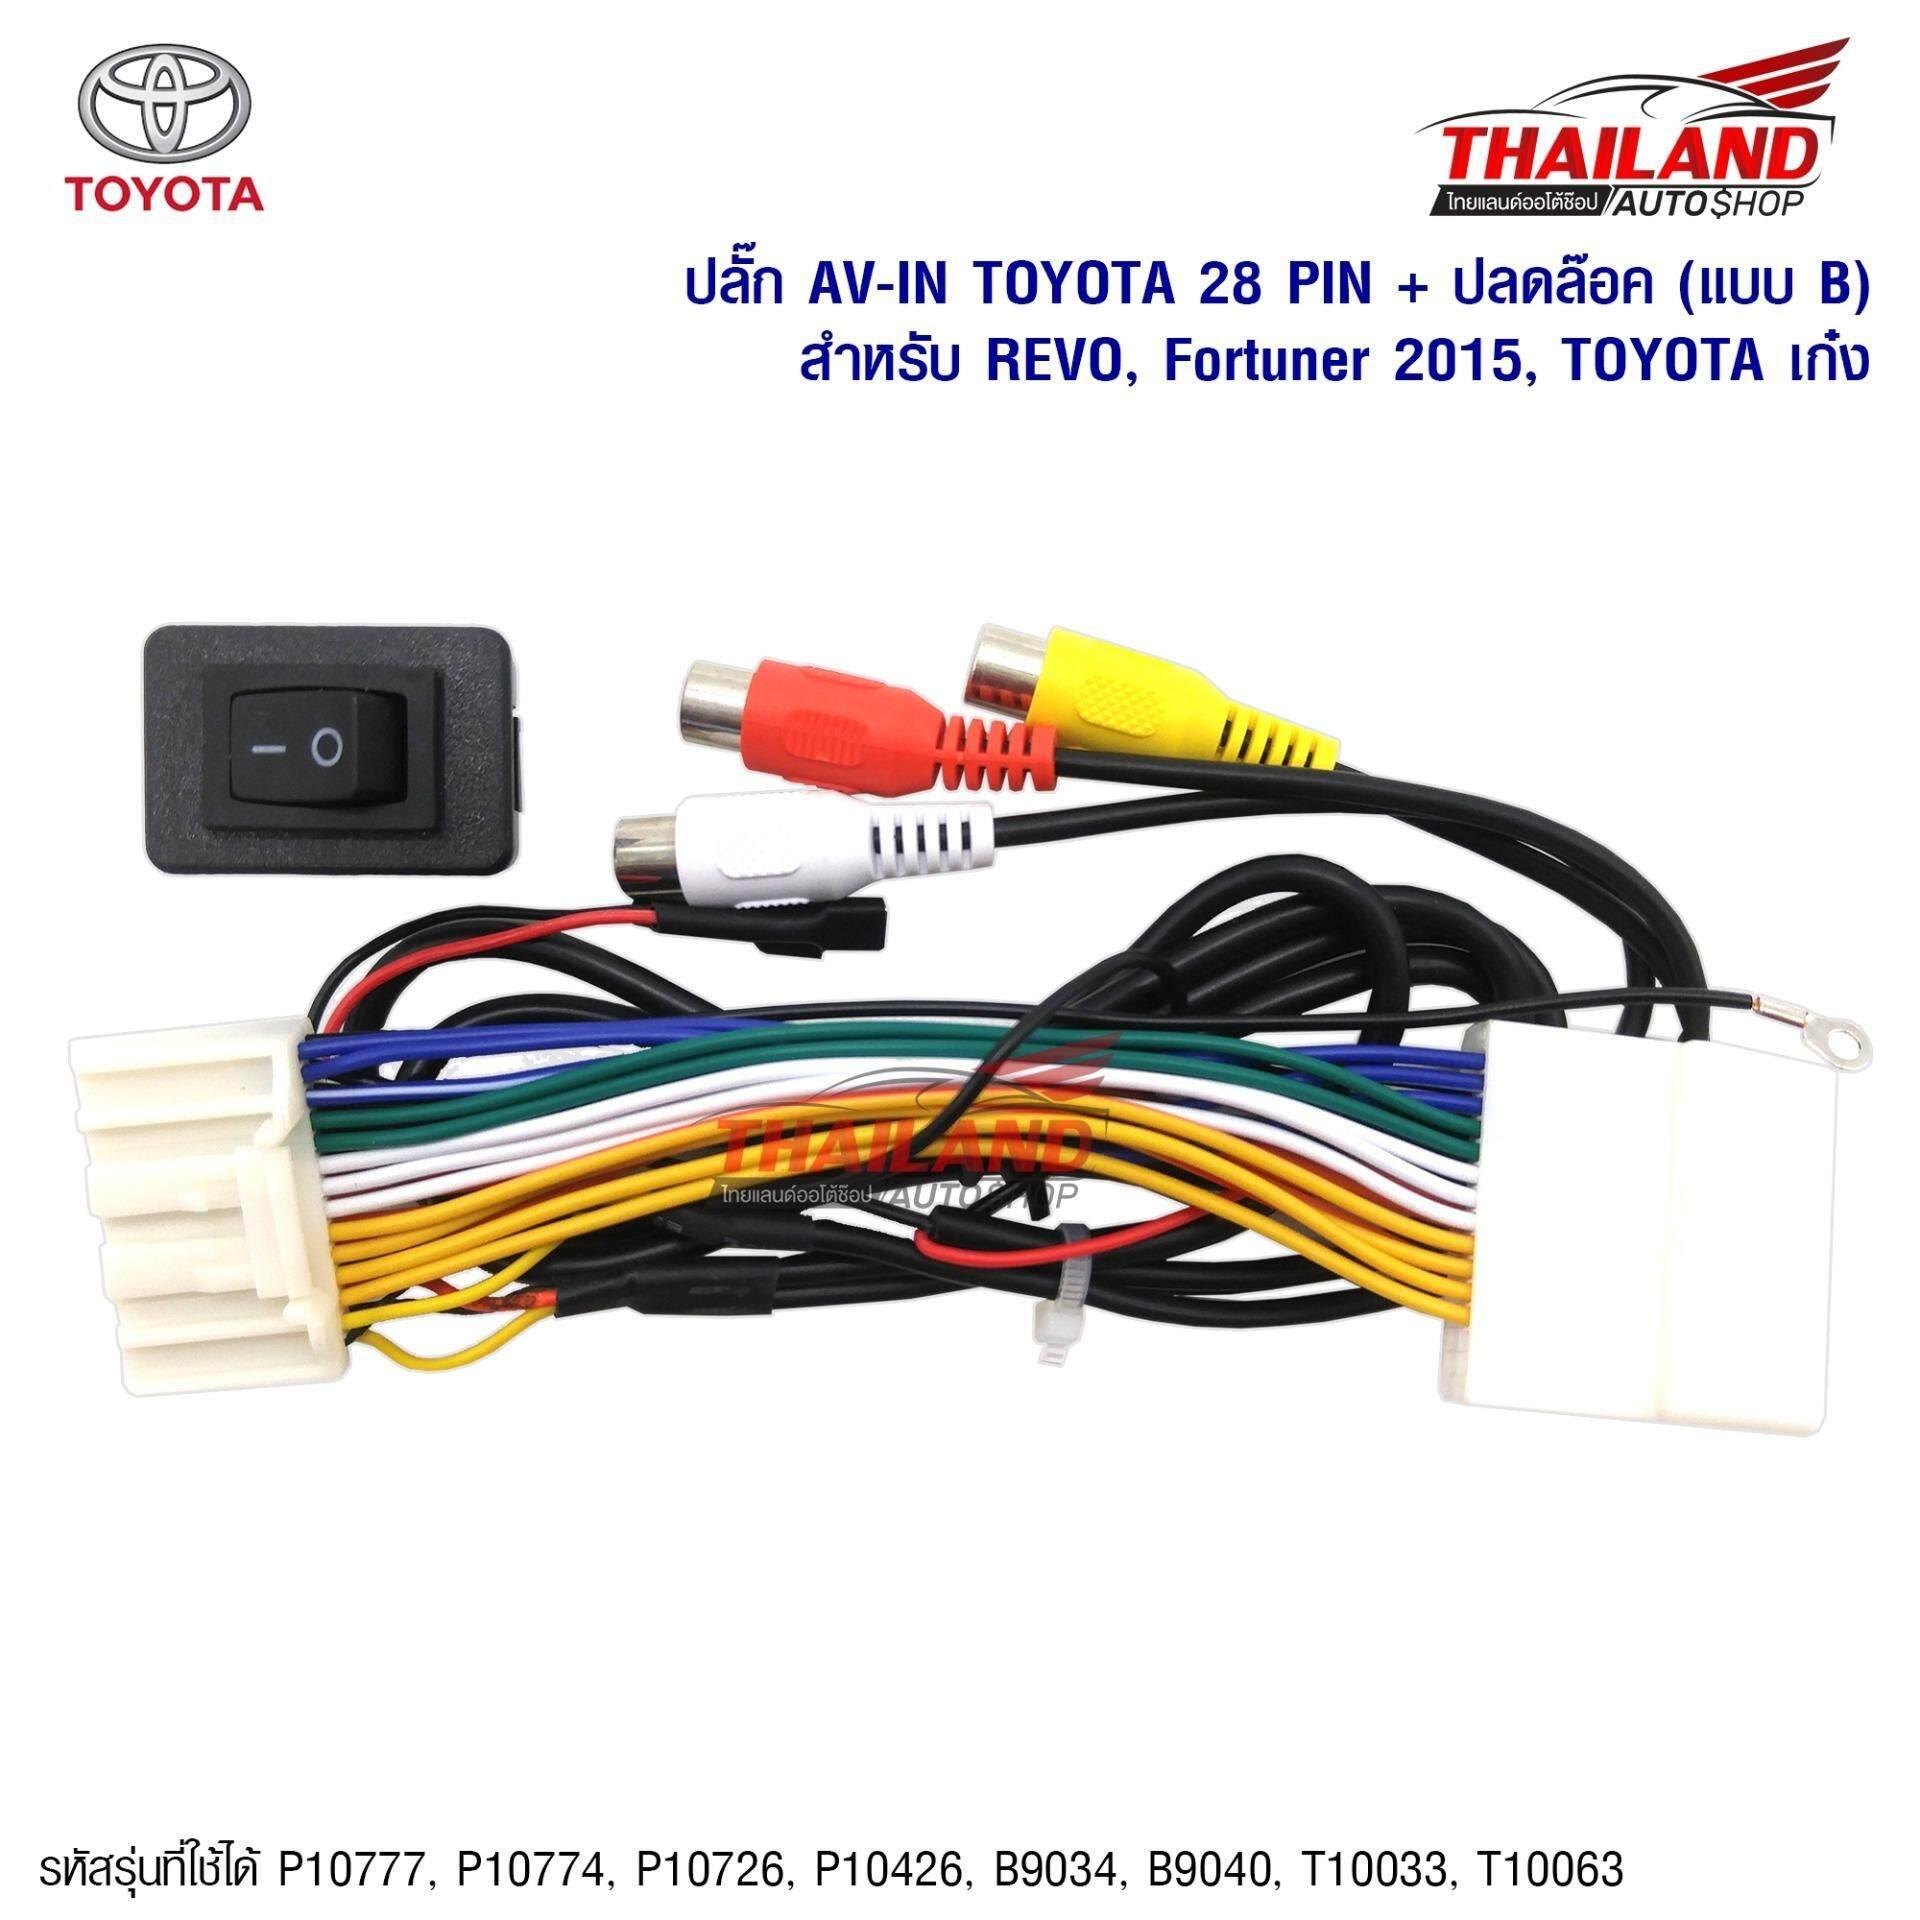 Thailand ปลัํก Av-In Toyota 28 Pin + ปลดล๊อค (แบบ B) สำหรับรถที่มี Navi .